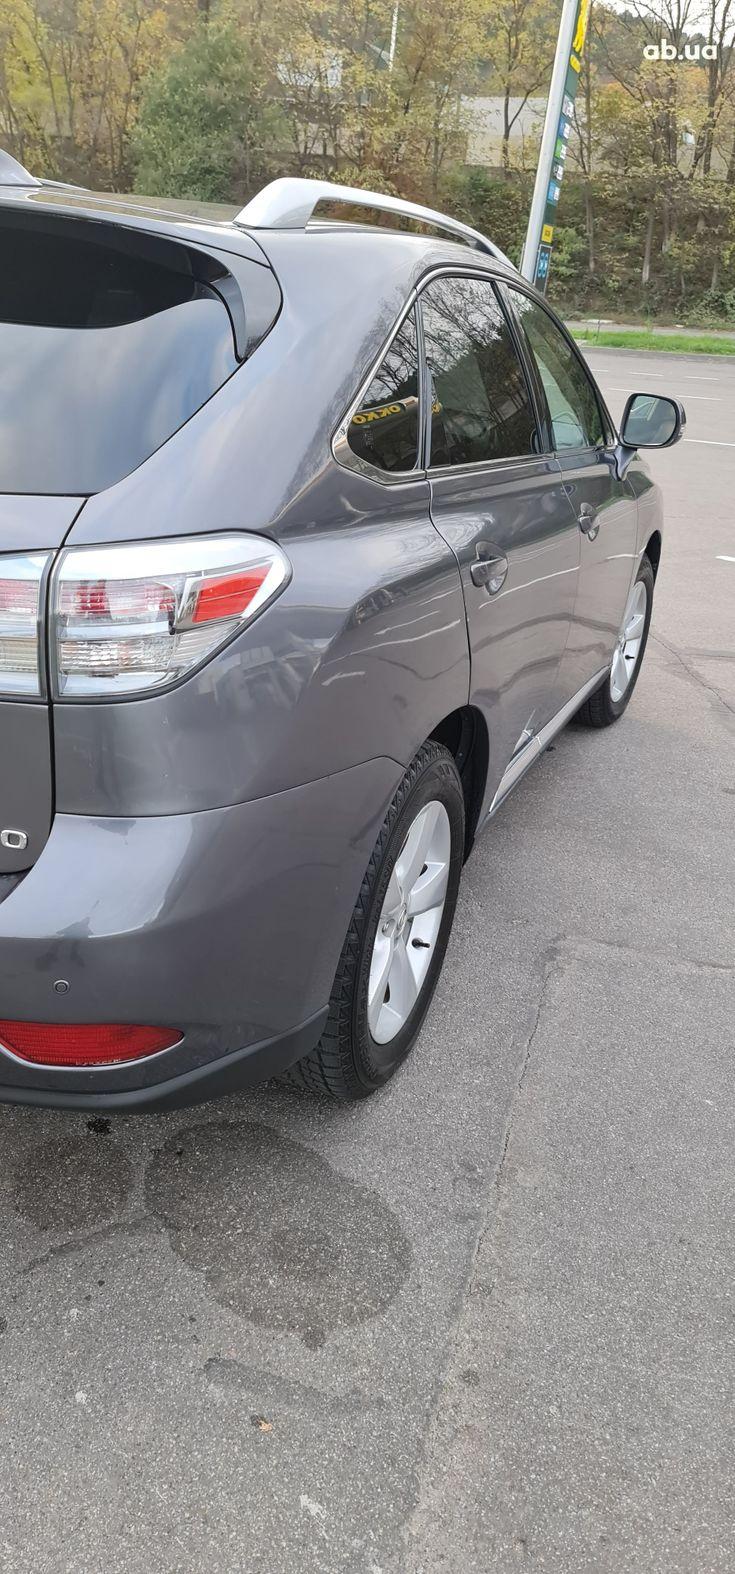 Lexus rx 350 2013 серый - фото 8